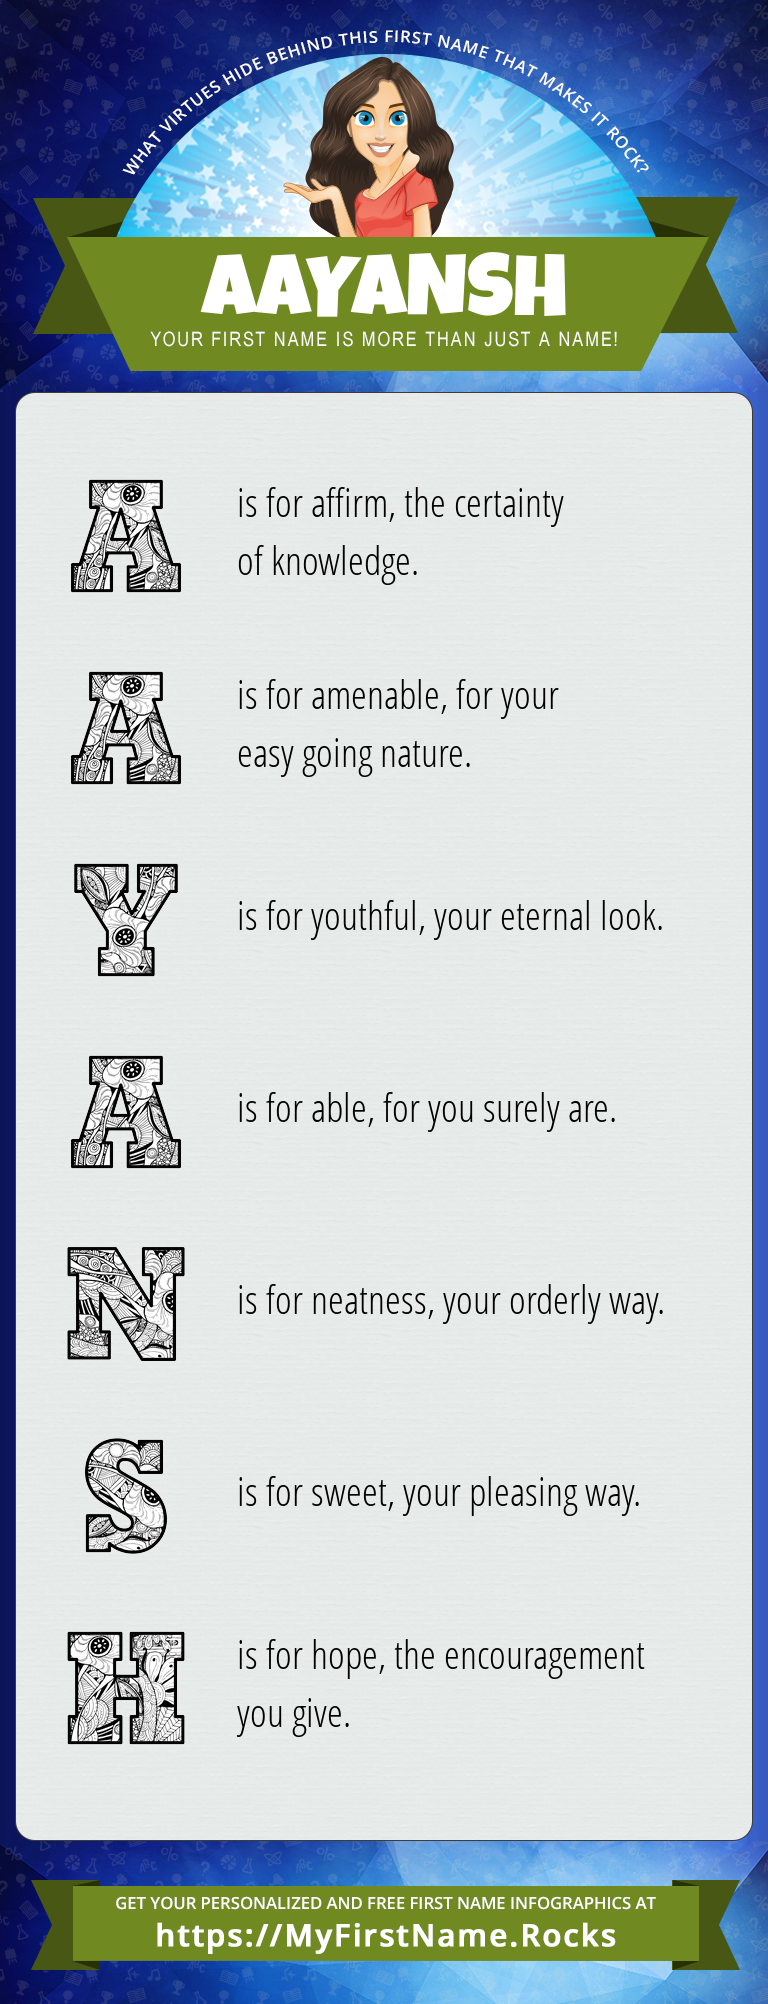 Aayansh Infographics